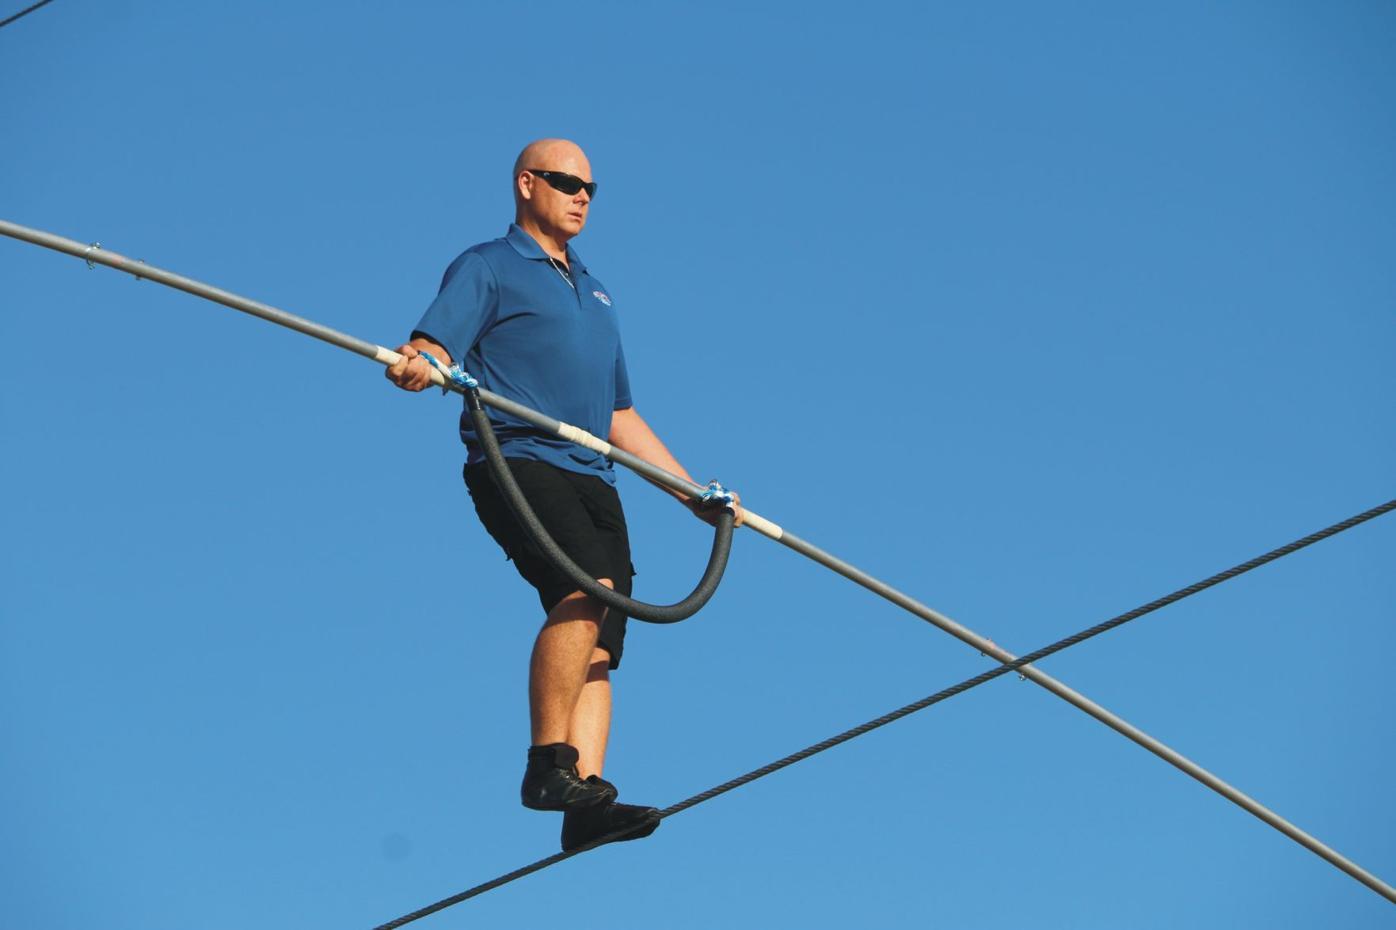 Wallenda - 'Highwire Live' training (copy)